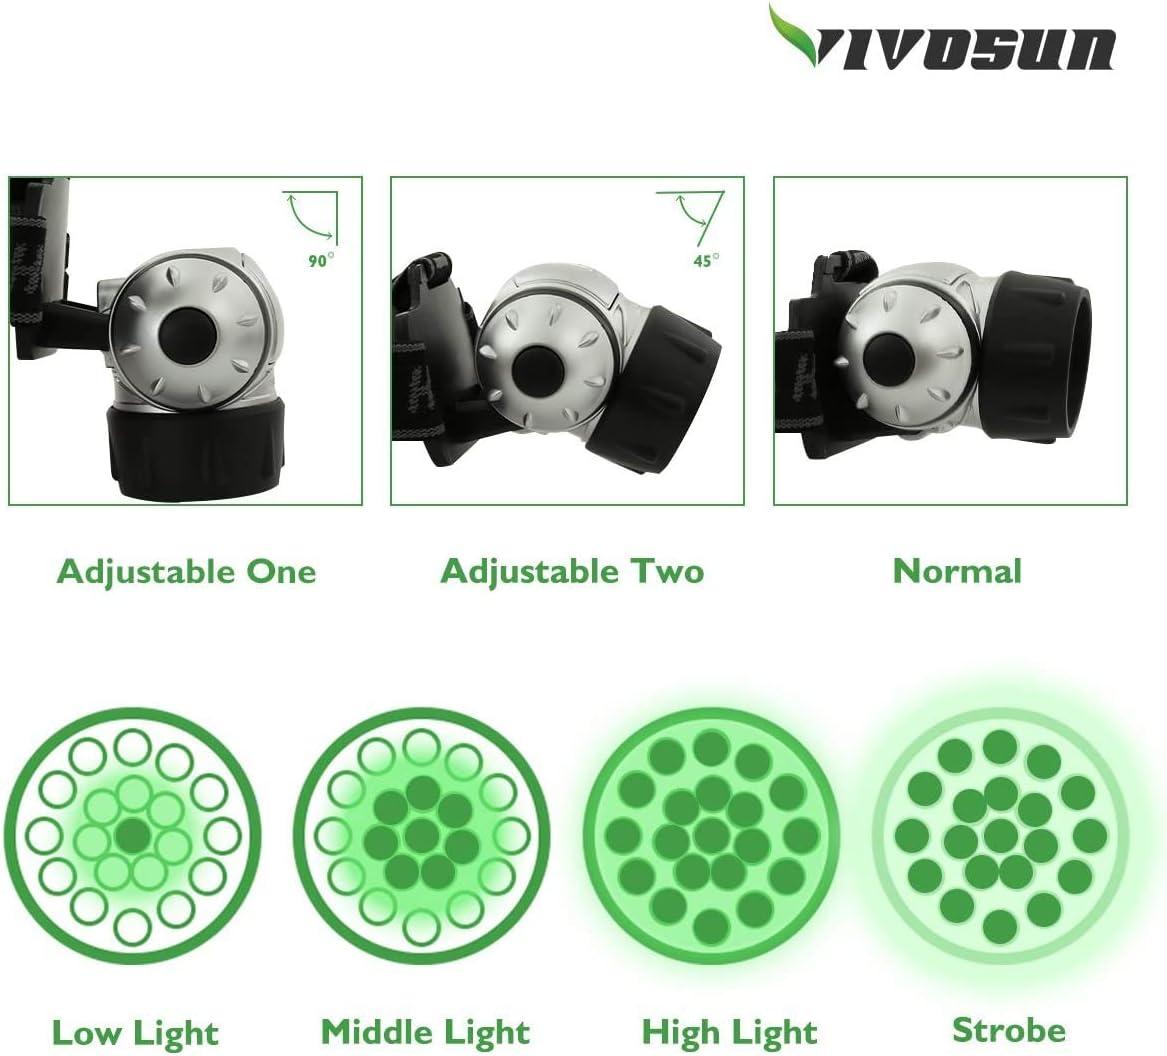 VIVOSUN 2 Pack 19 Bulbs High Intensity LED Green Light Grow Room Headlight